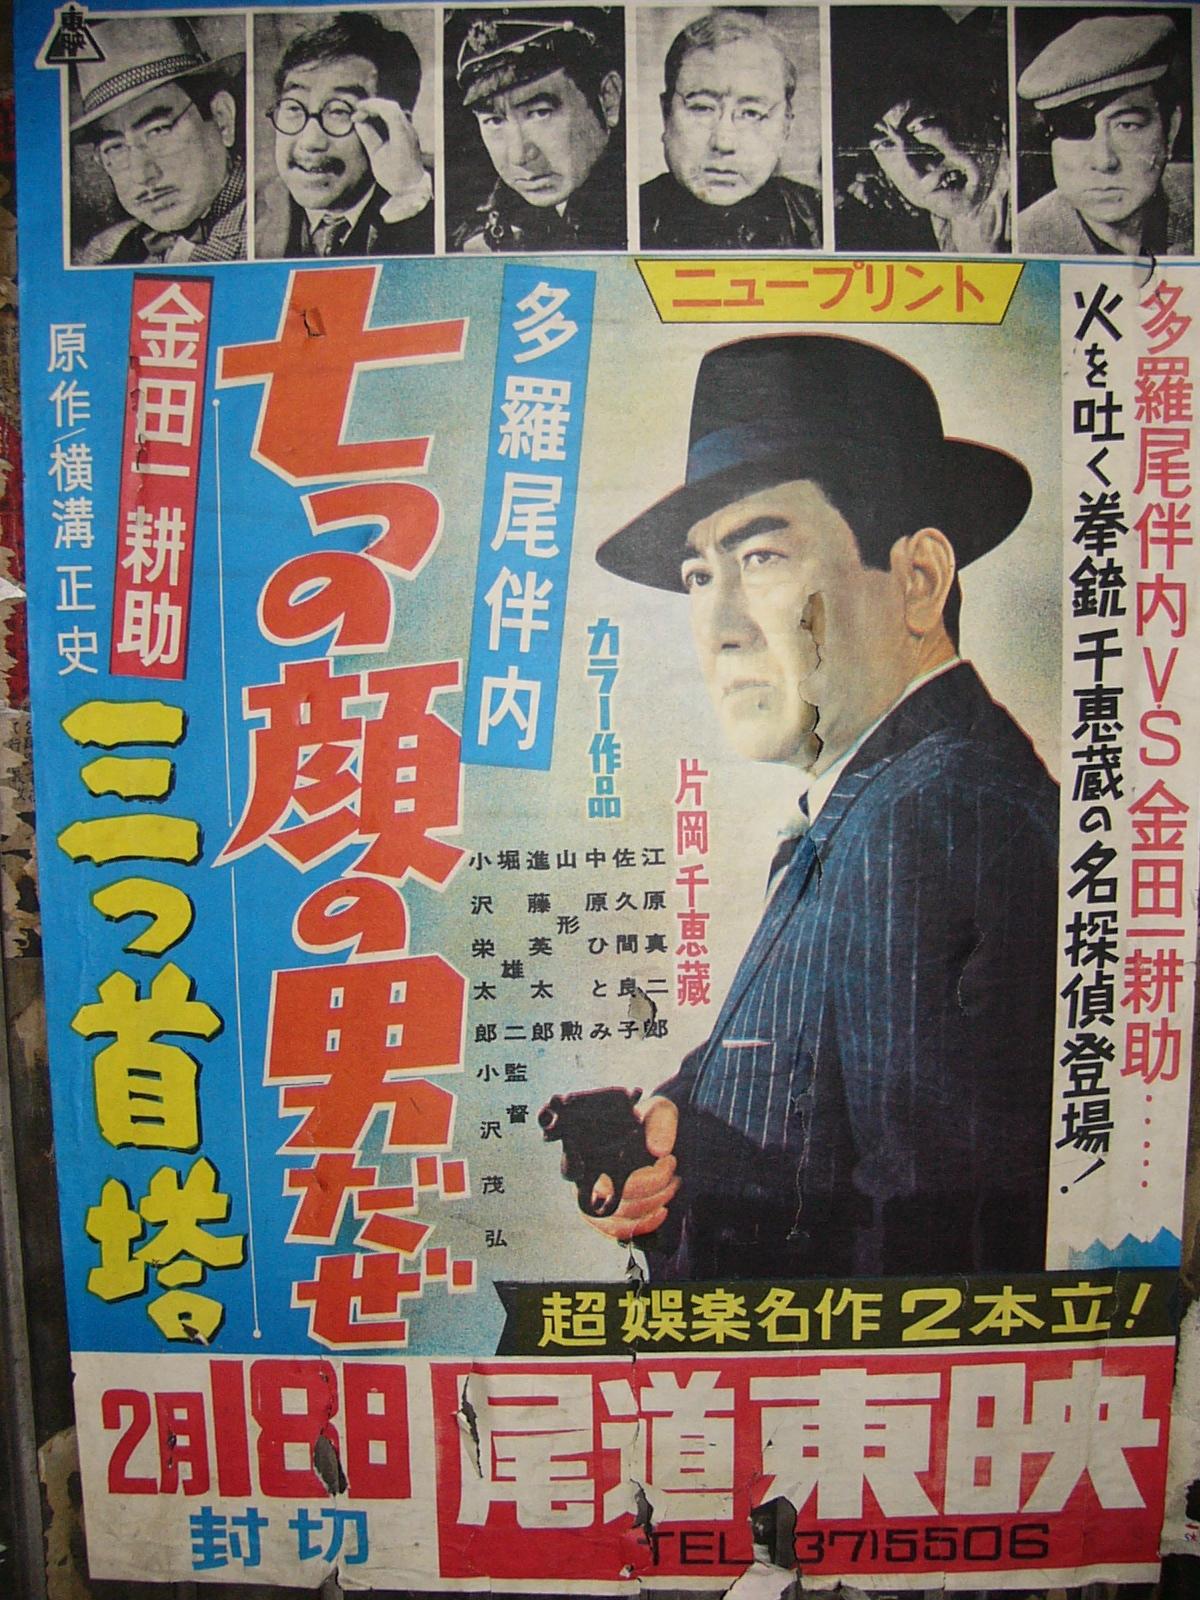 http://image01w.seesaawiki.jp/r/a/retro_kinema/c5bdfdf696ad7827.JPG